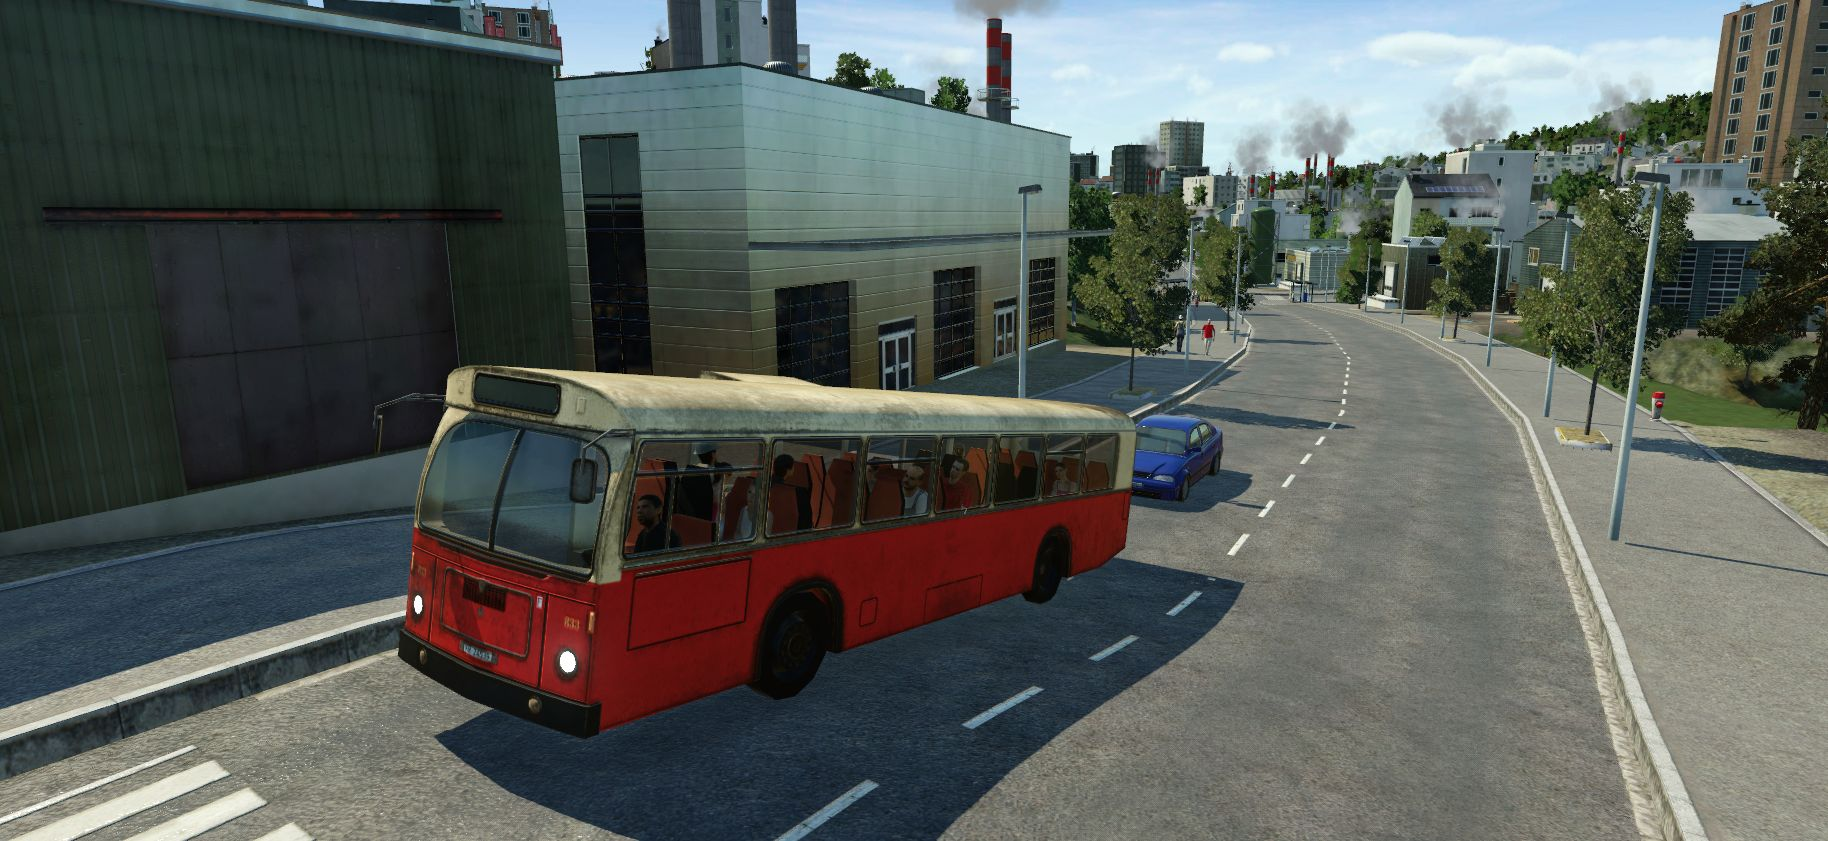 Transport Fever - recenze + průvodce hrou 12843